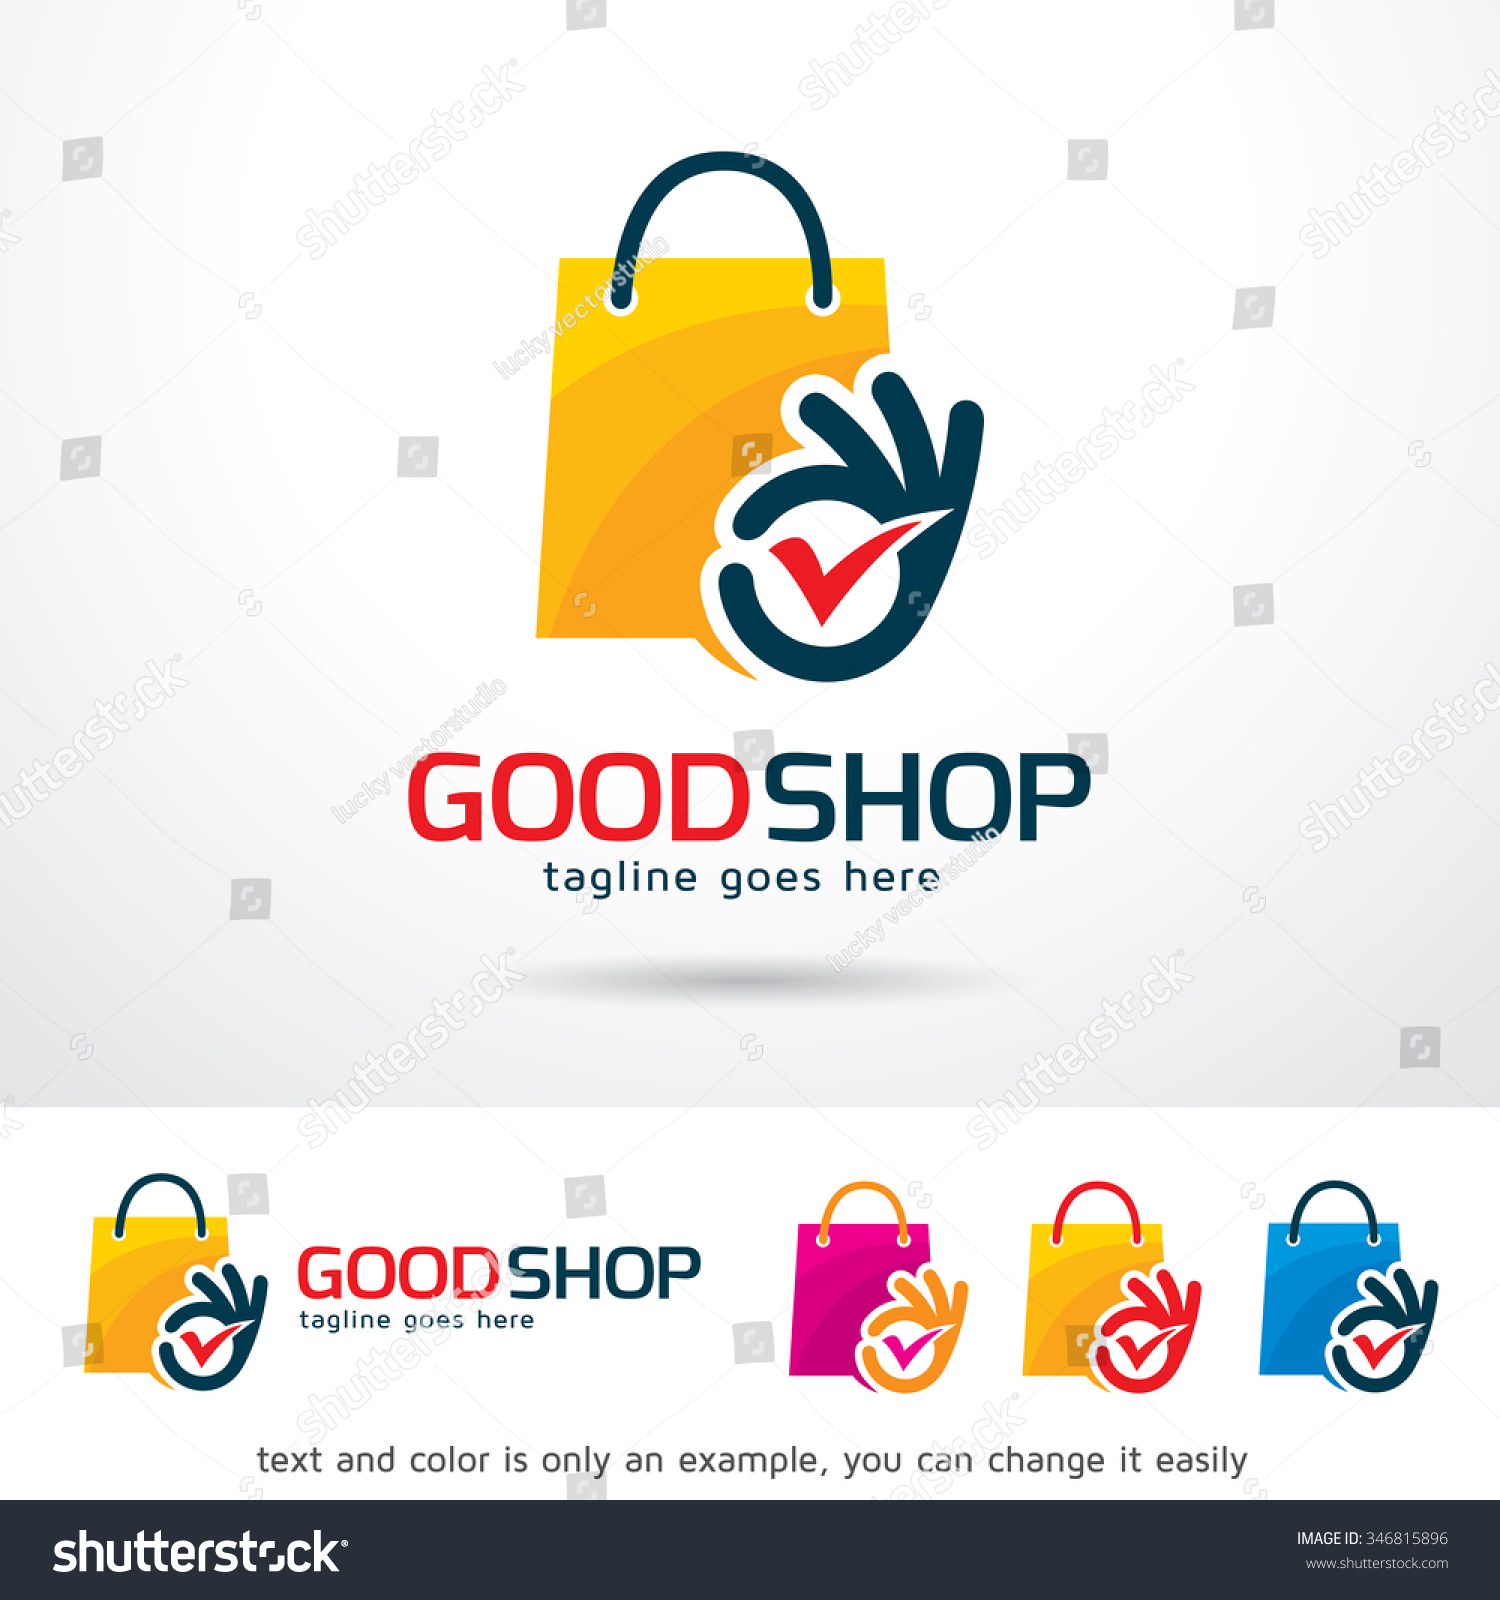 how to make online shop logo